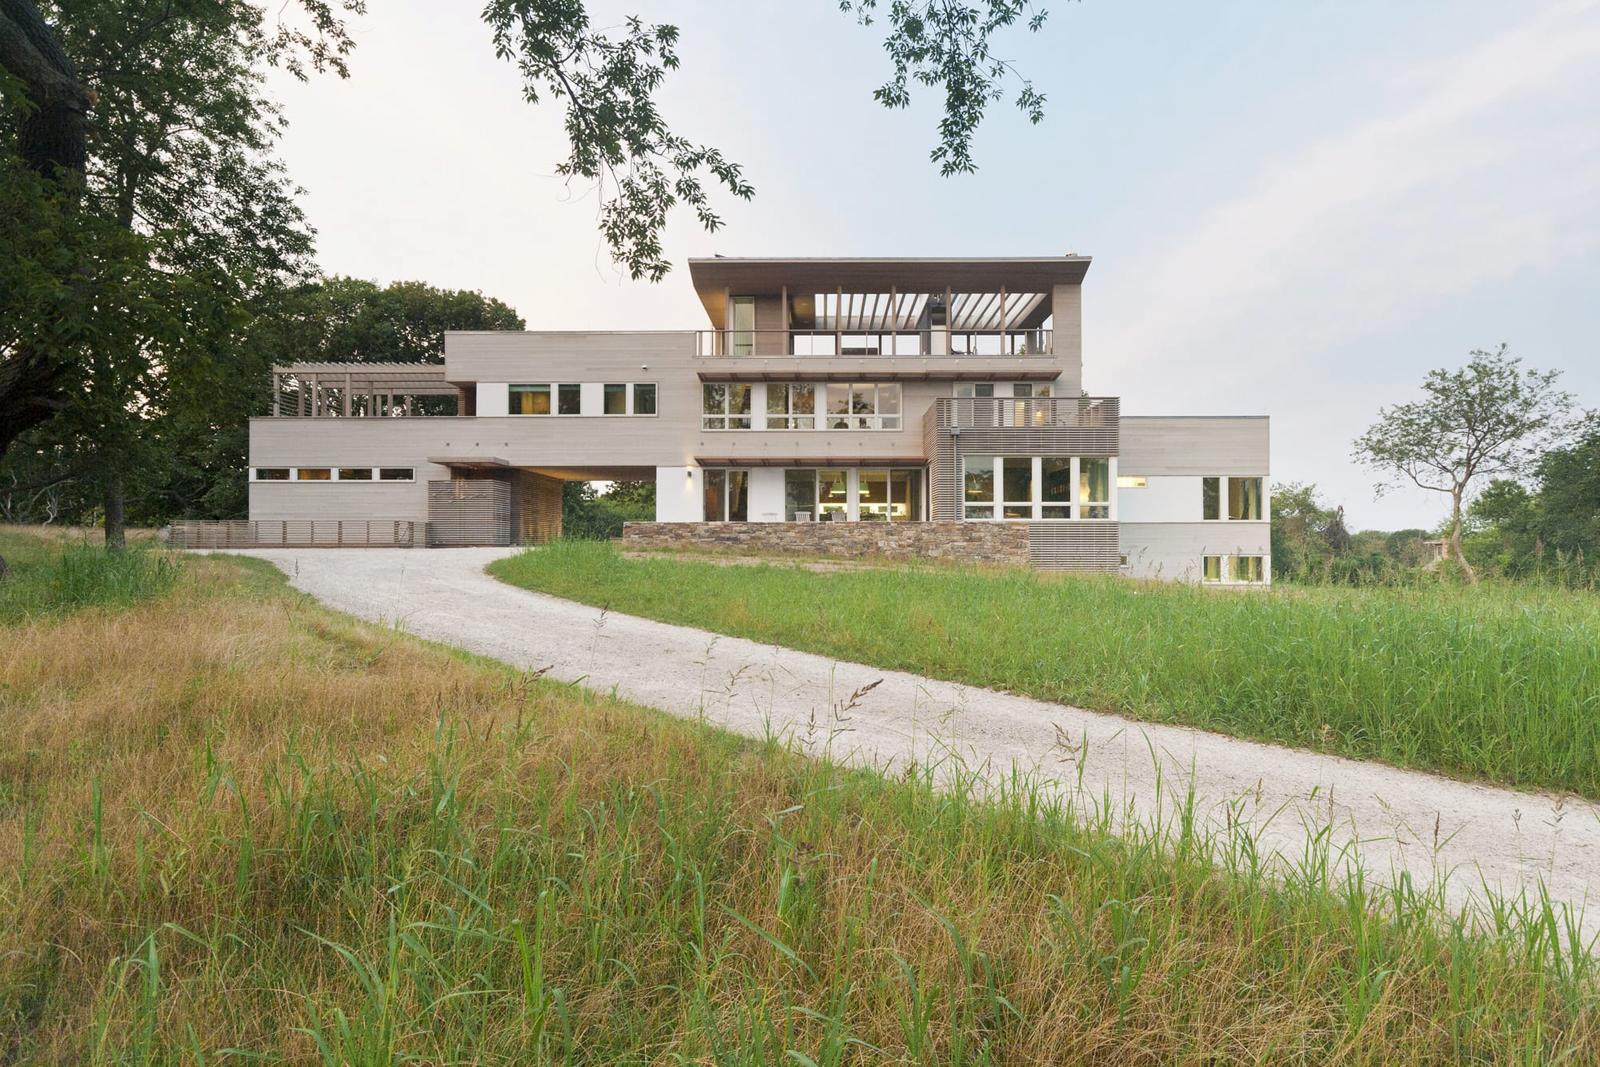 05-res4-resolution-4-architecture-modern-modular-home-prefab-house-fishers-island-exterior.jpg